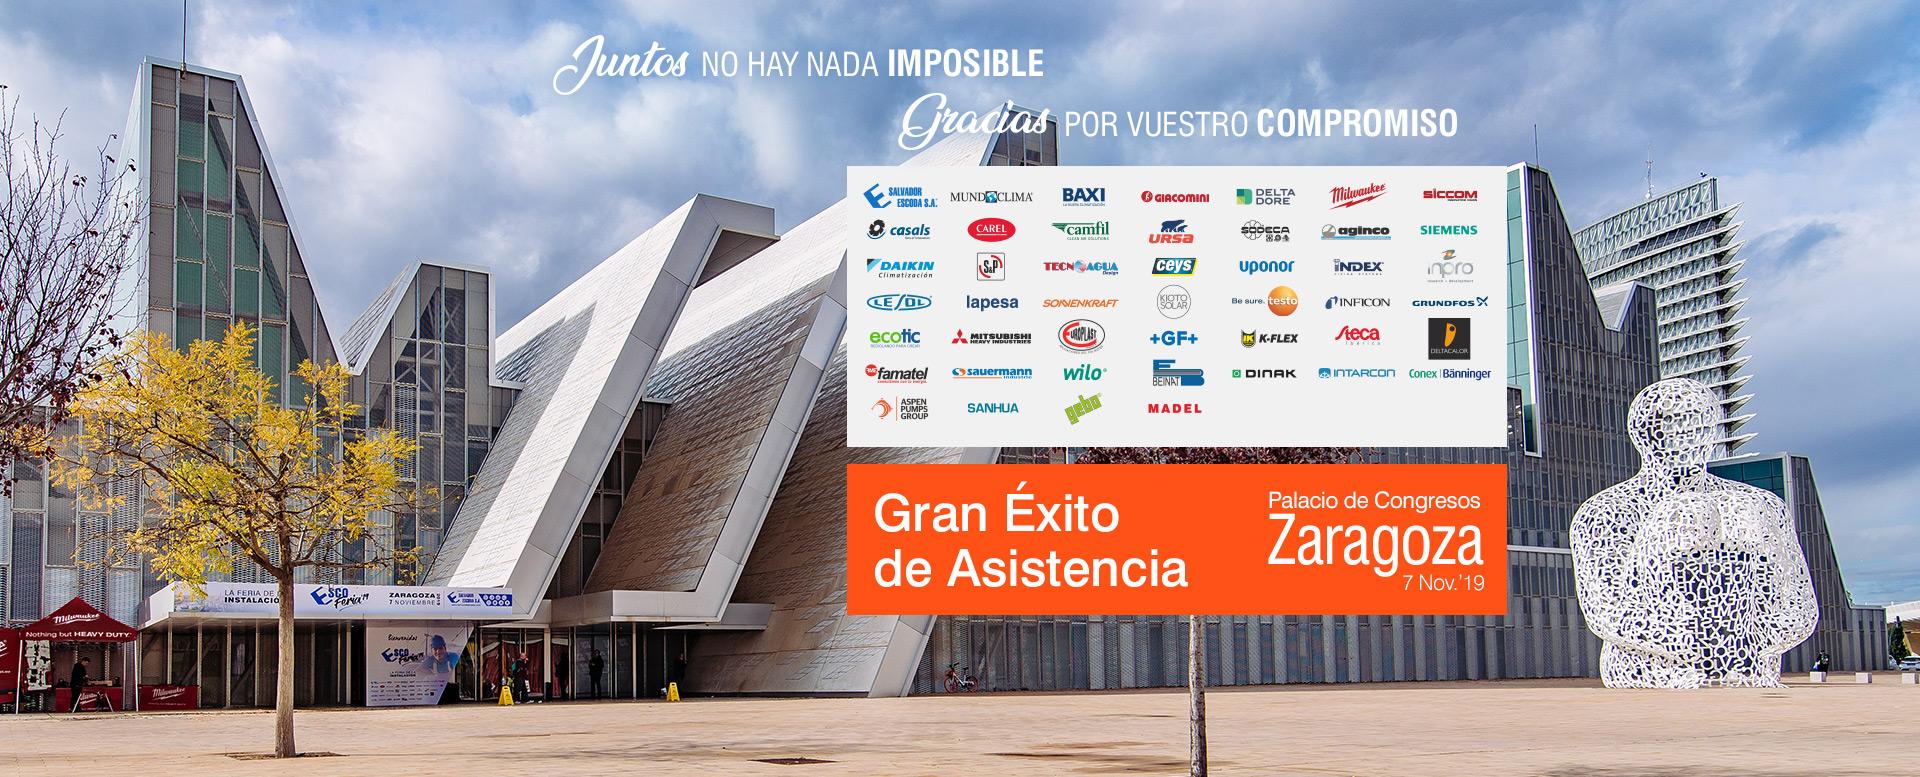 Escoferia Zaragoza